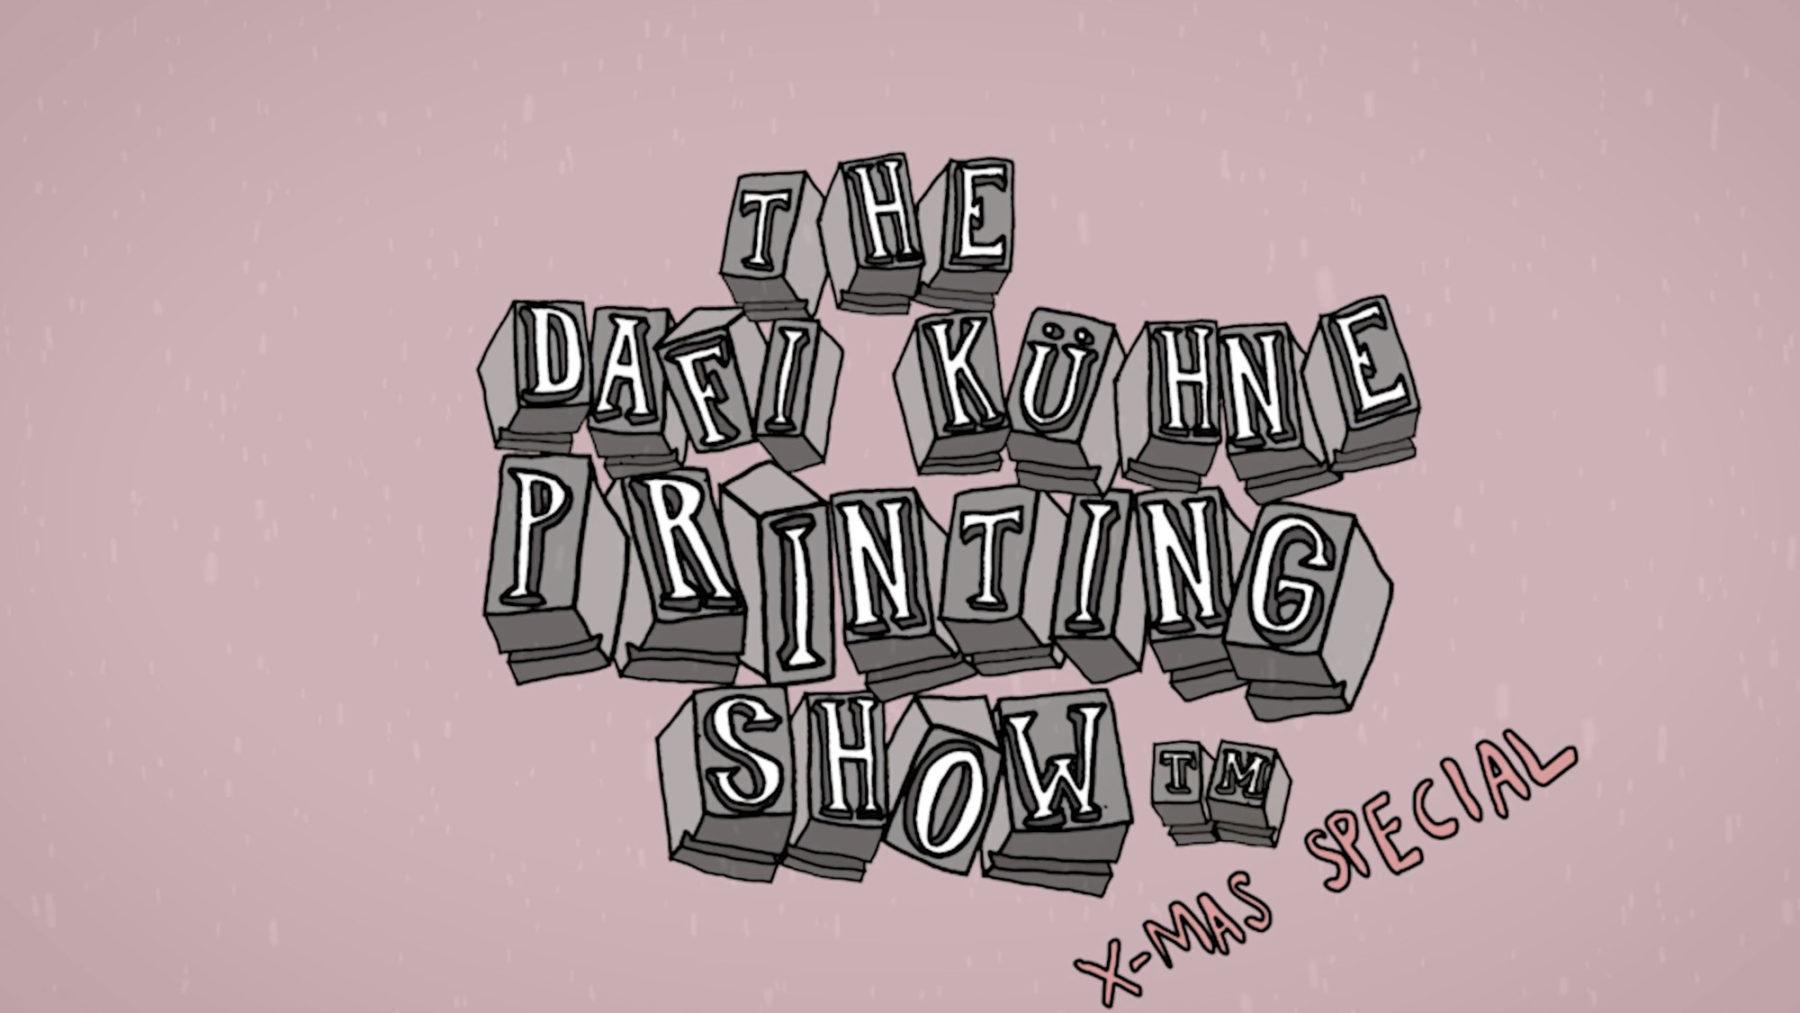 Dafi Kuhne printing show 1